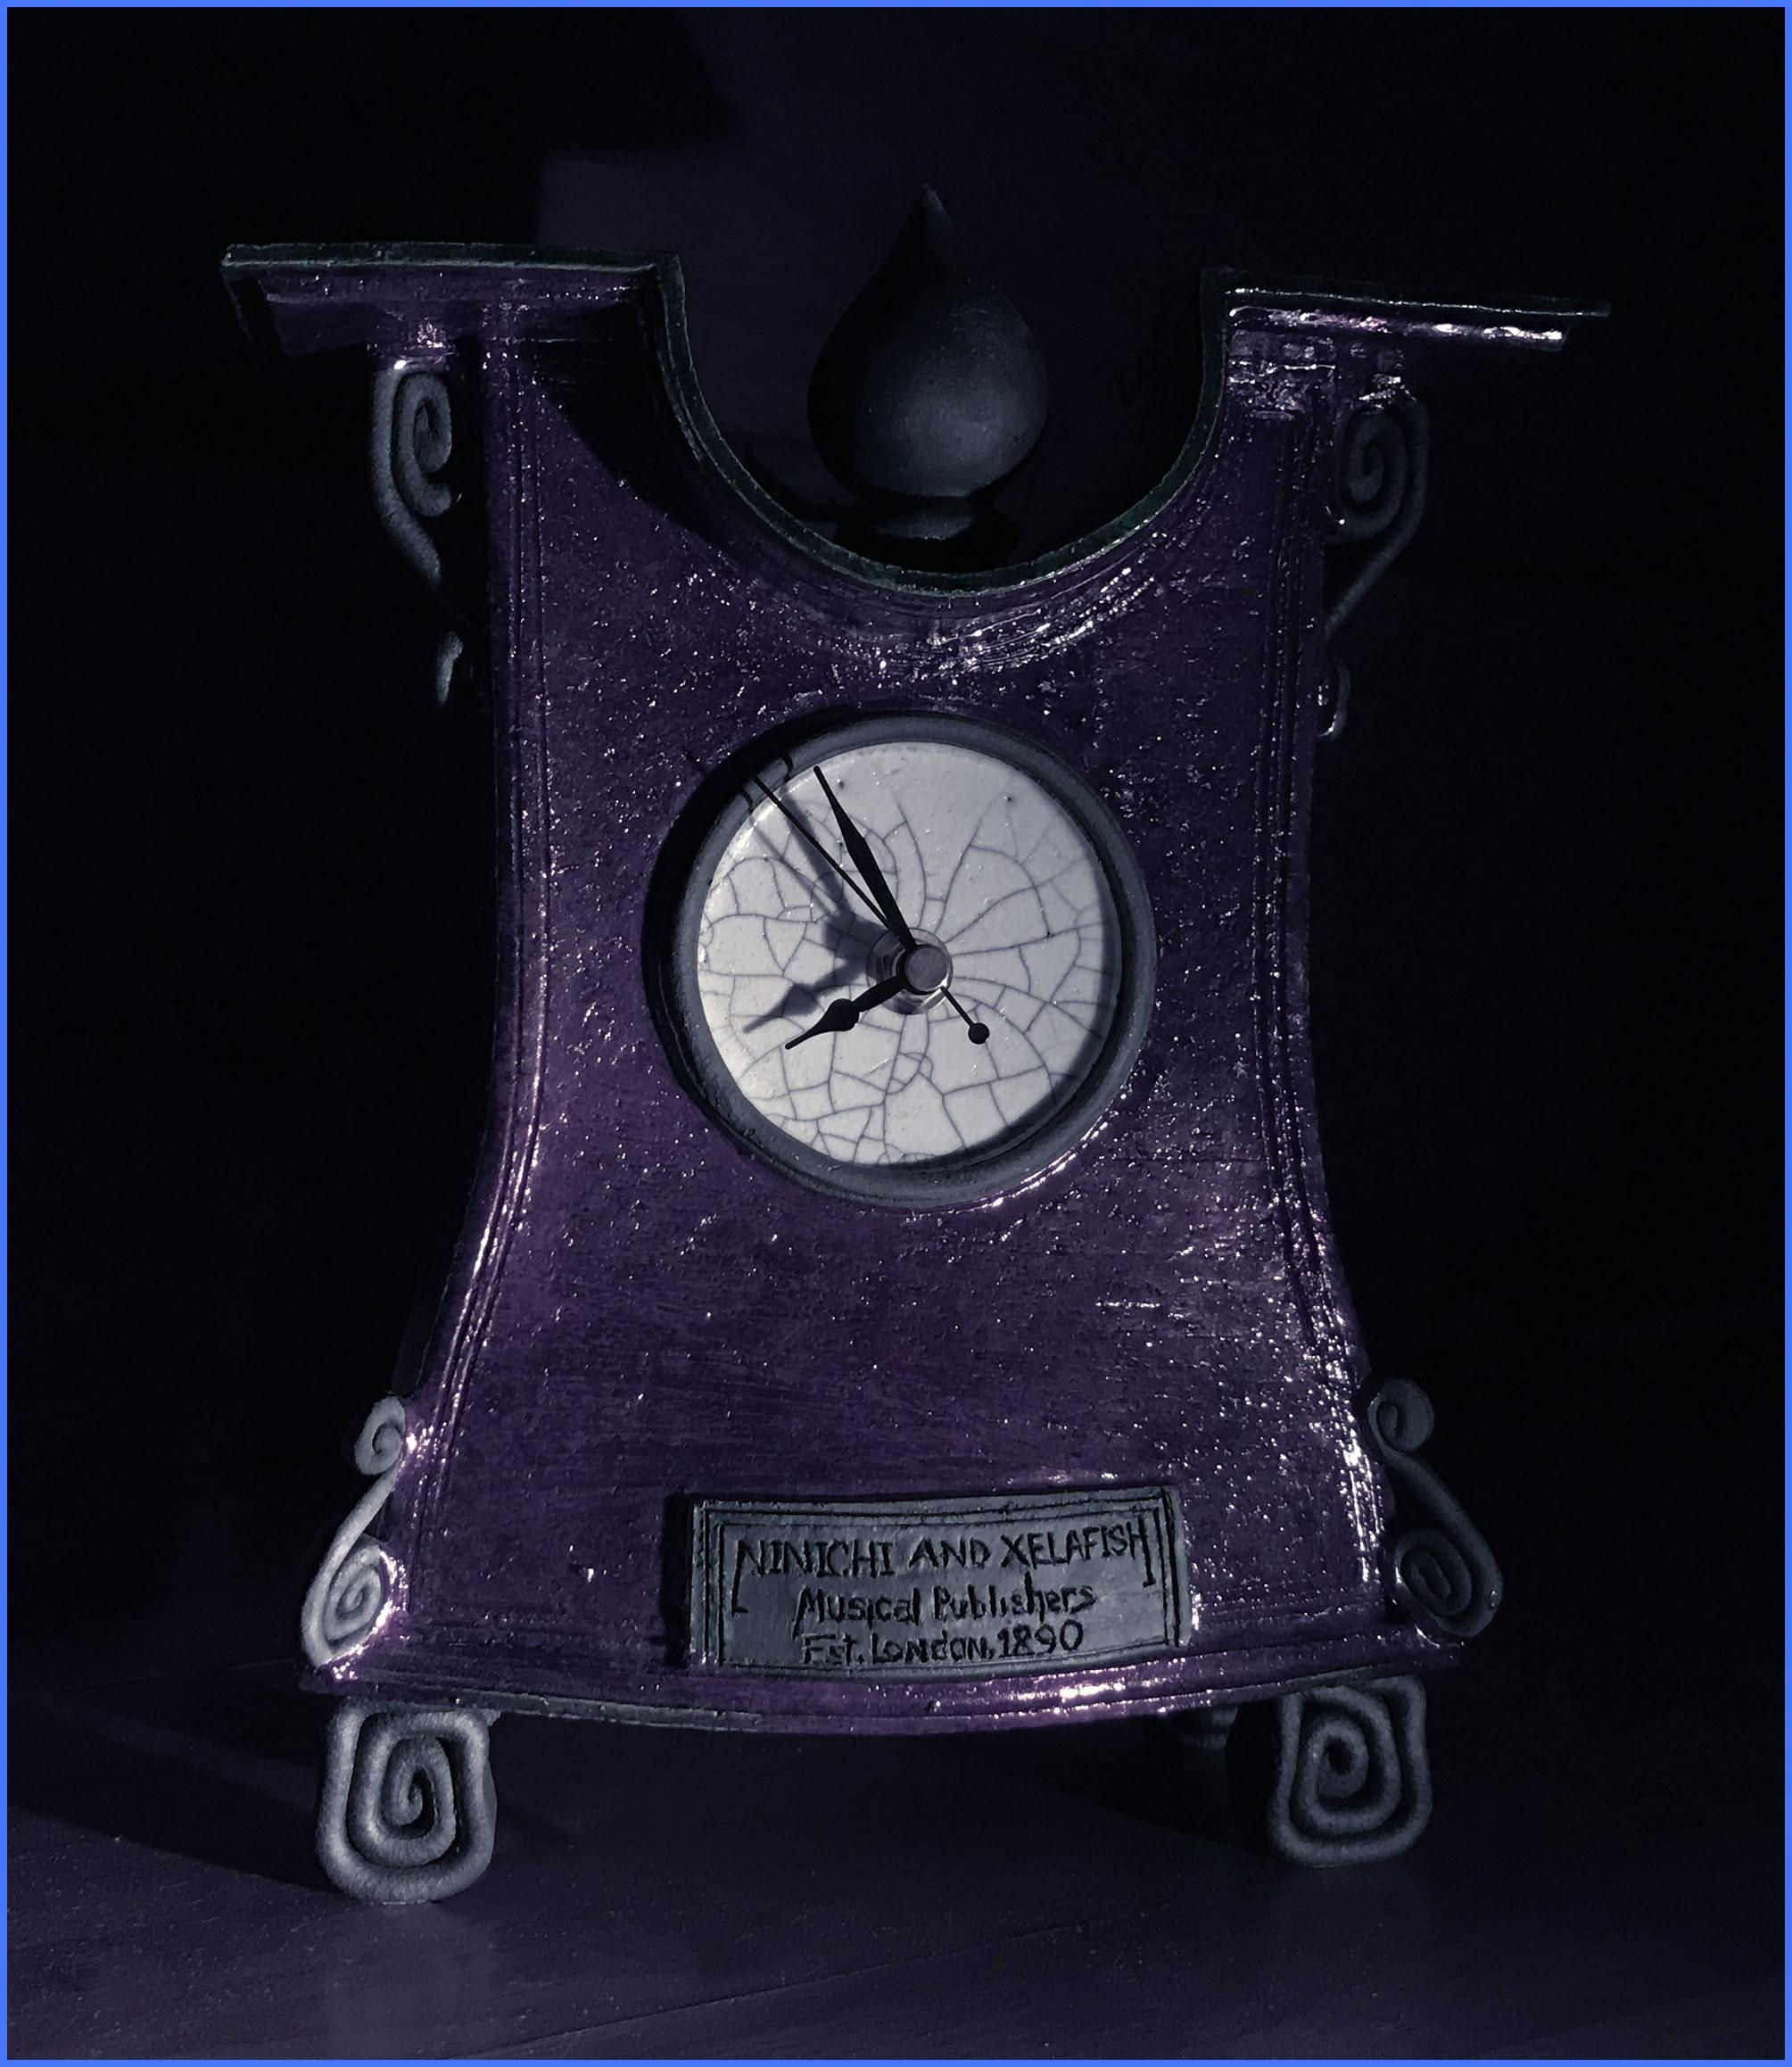 The Rakukyra Clock of Ninichi and Xelafish, London, 1890.